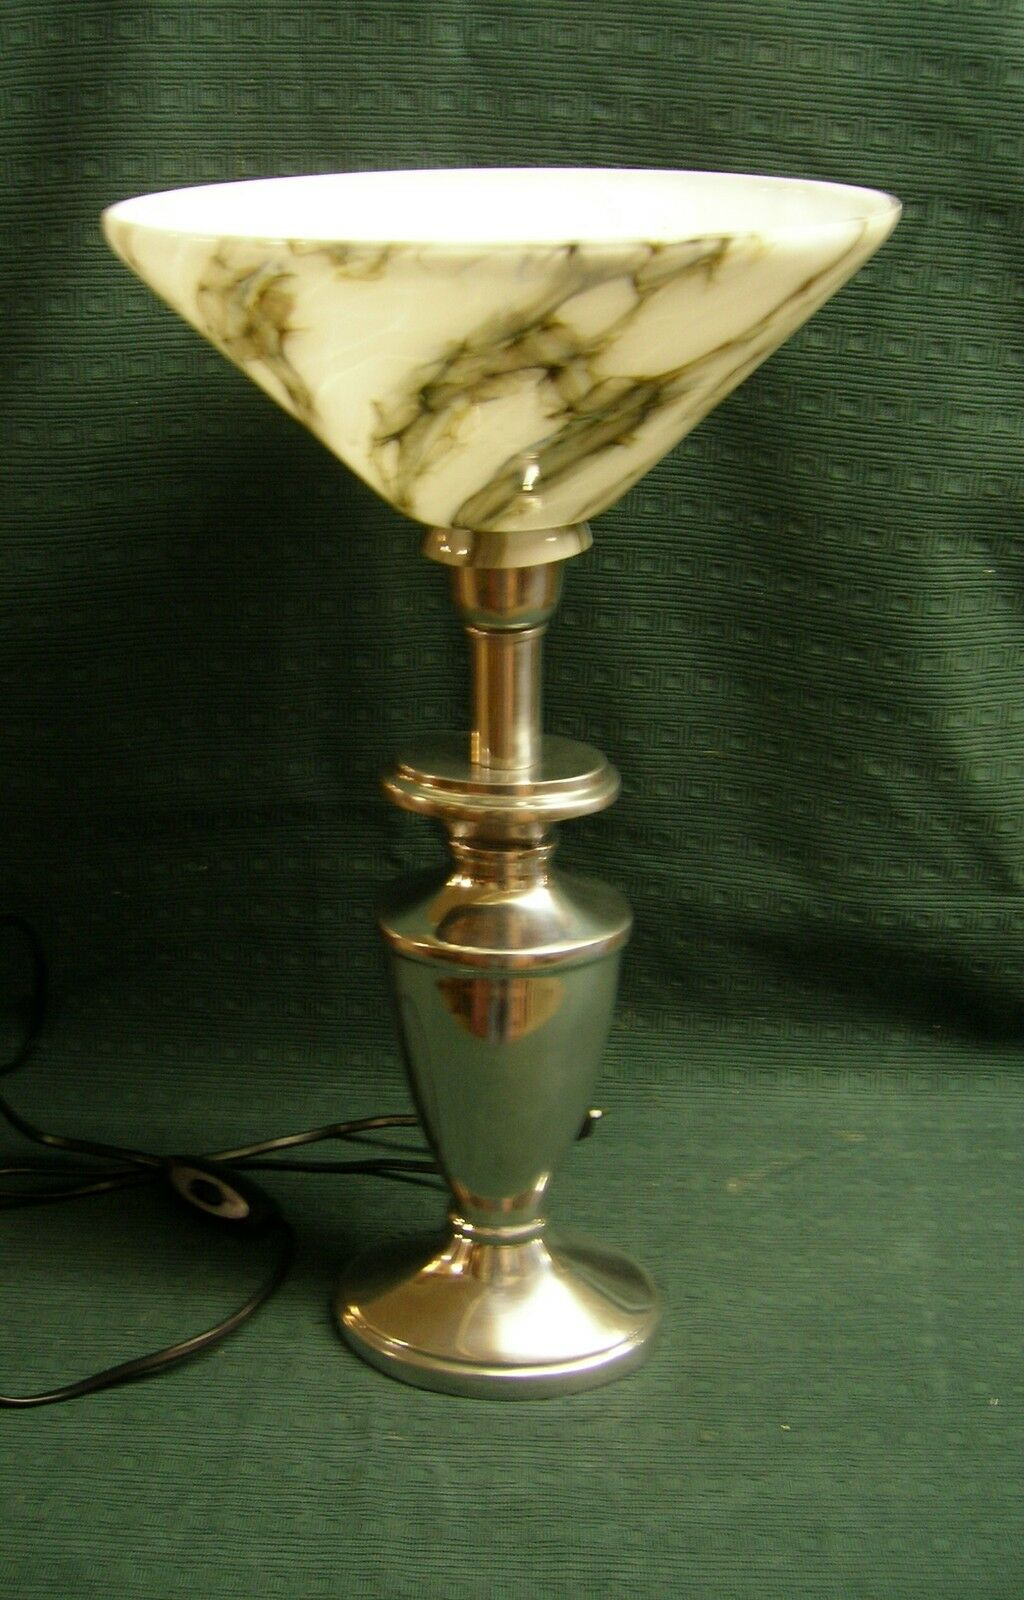 stehlampe mit lampenschirm berfangglas unikat eur 98 00 picclick de. Black Bedroom Furniture Sets. Home Design Ideas